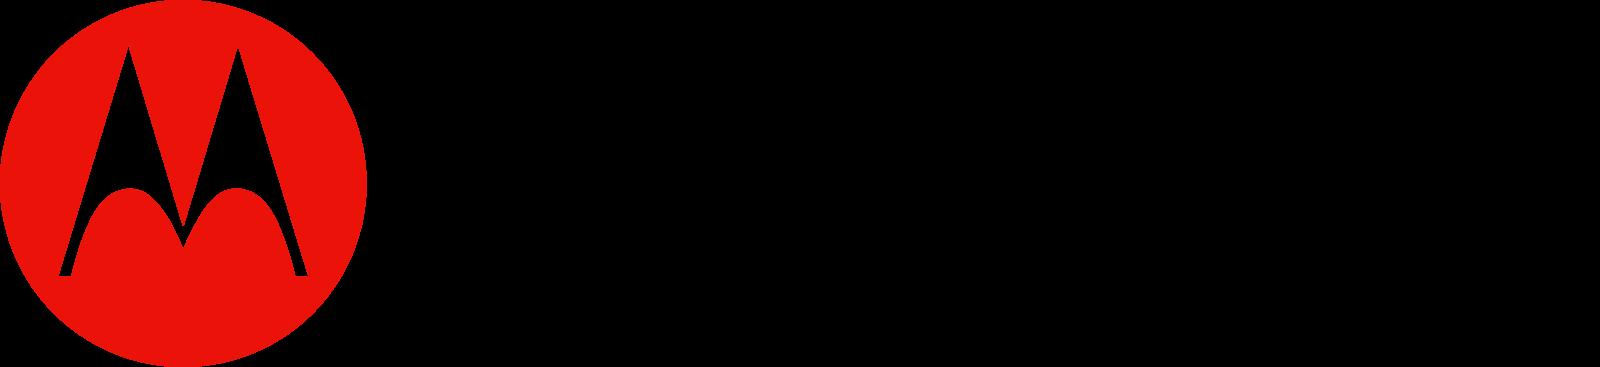 motorola logo 2 - Motorola Logo